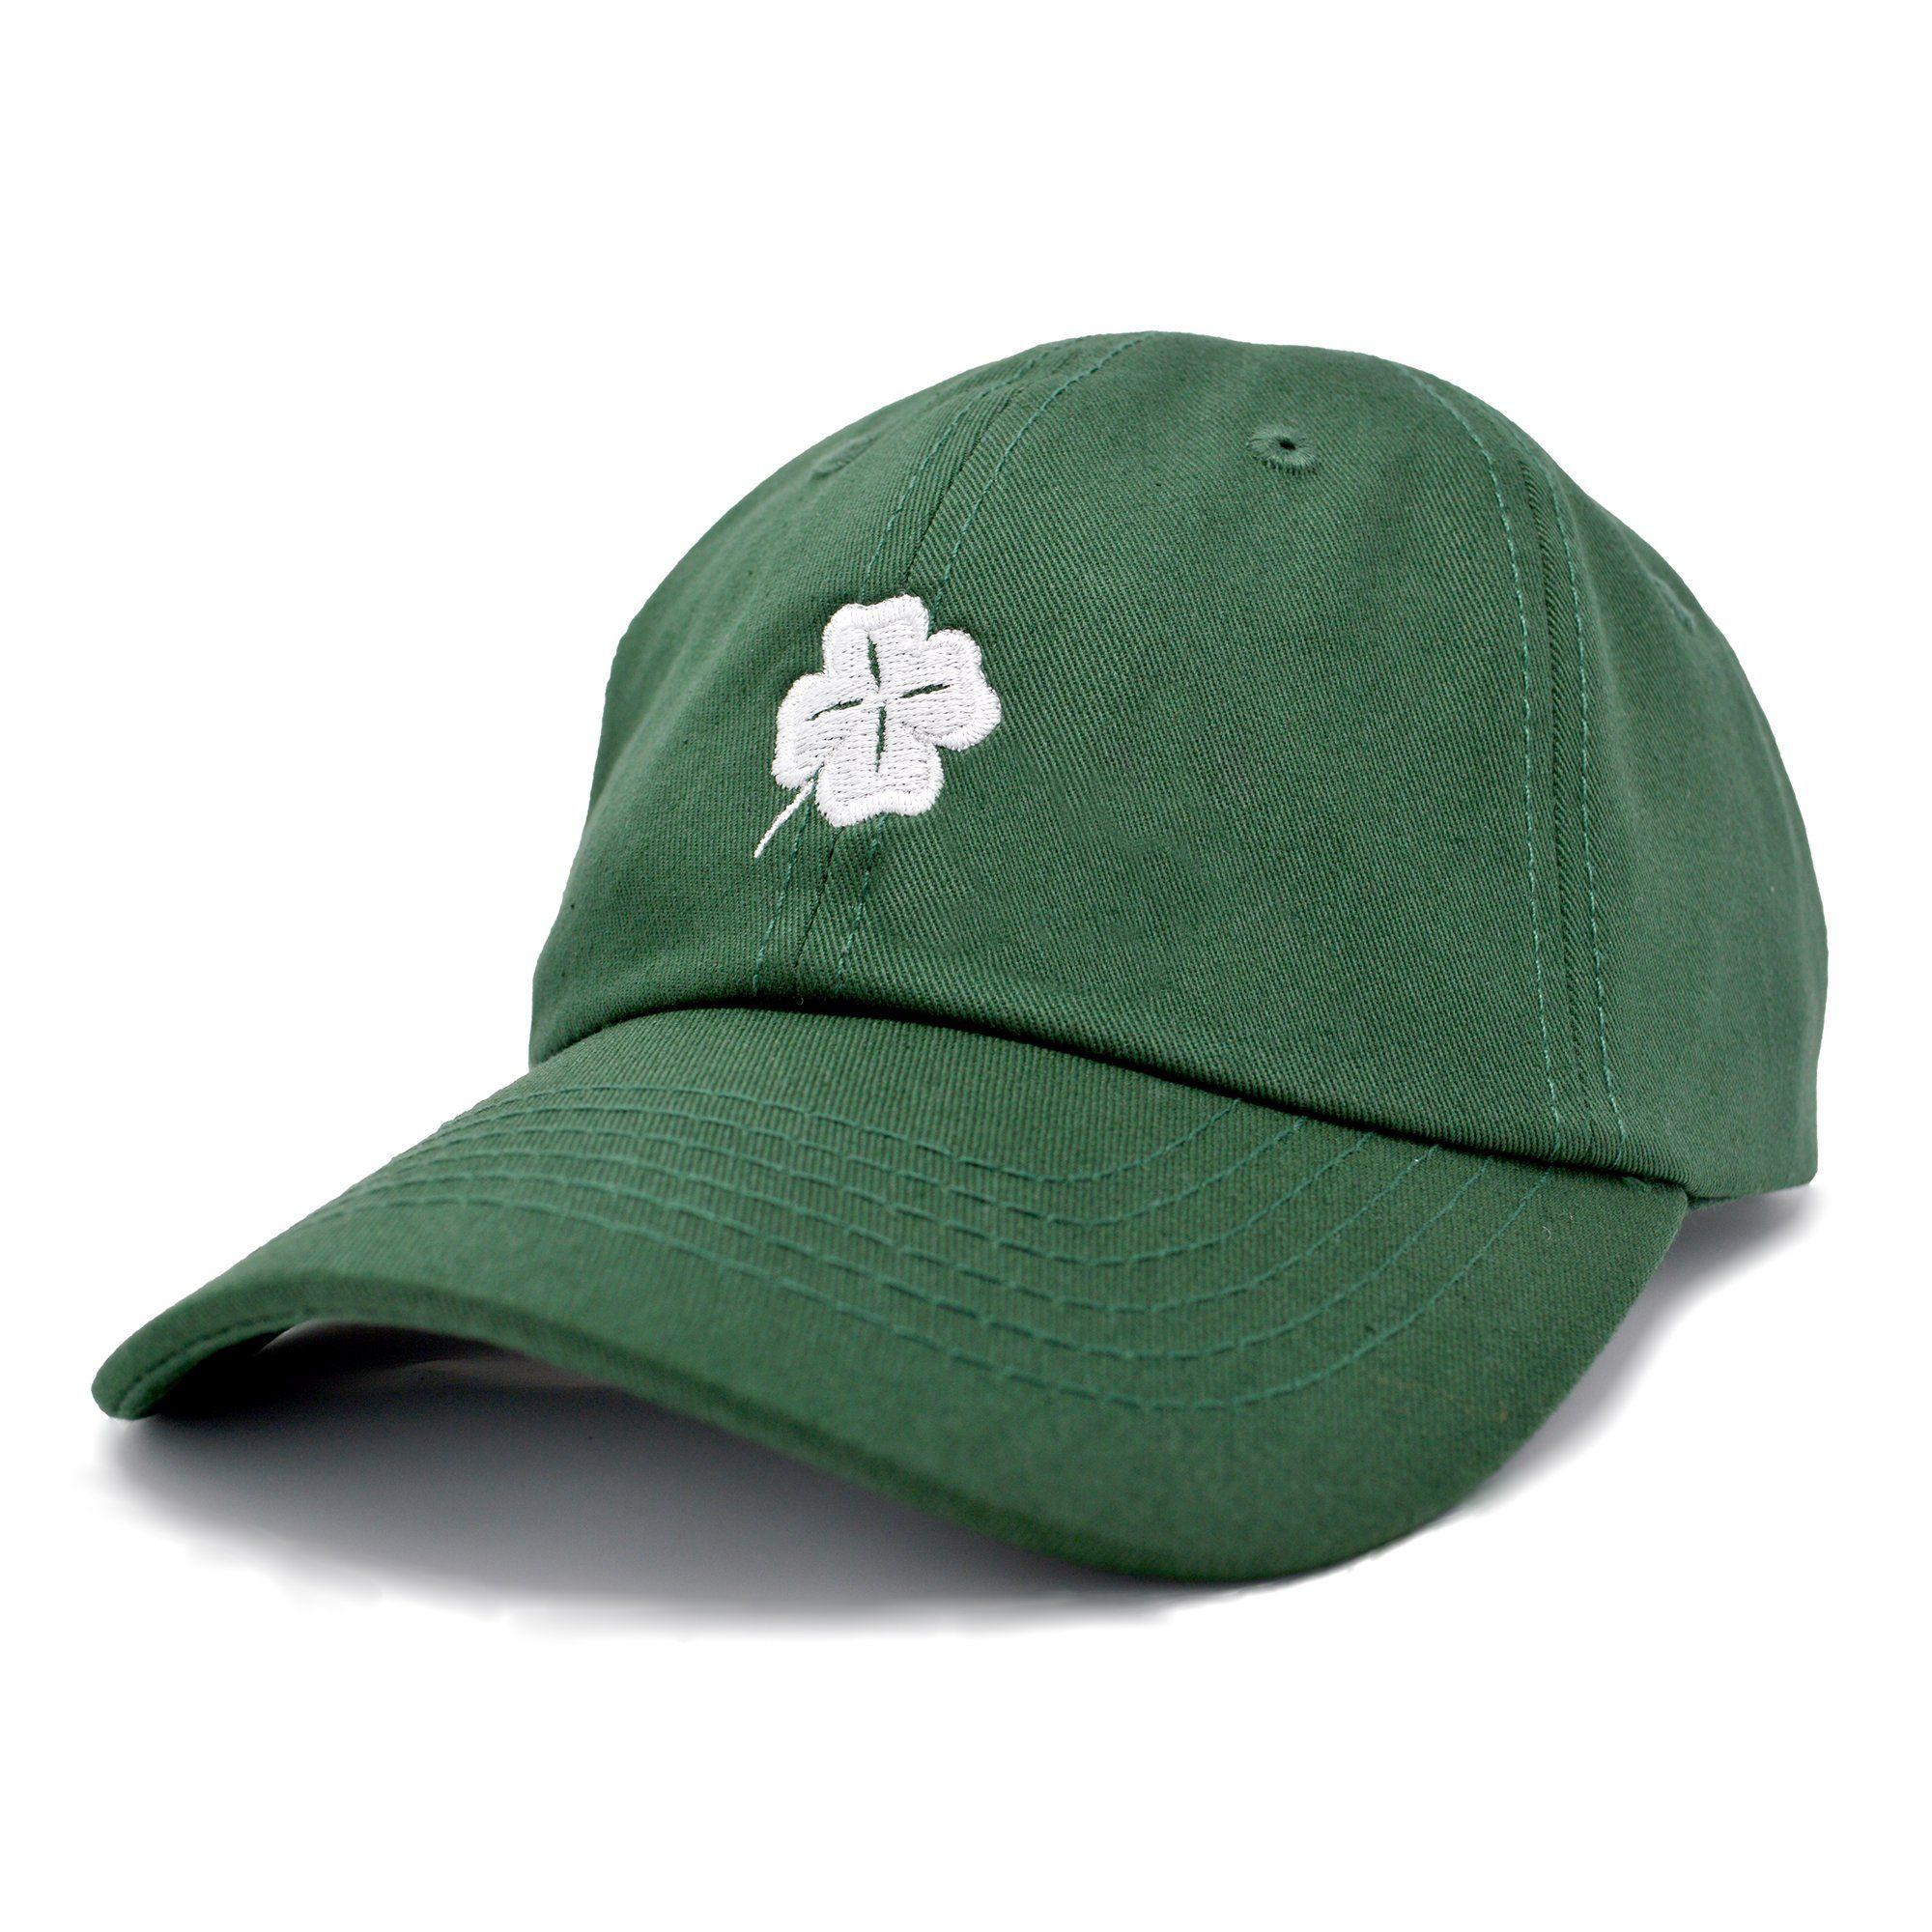 8519a622e63 DALIX Shamrock Hat Unisex Baseball Cap St Patricks Day Cotton Four Leaf  Clover Soft Caps